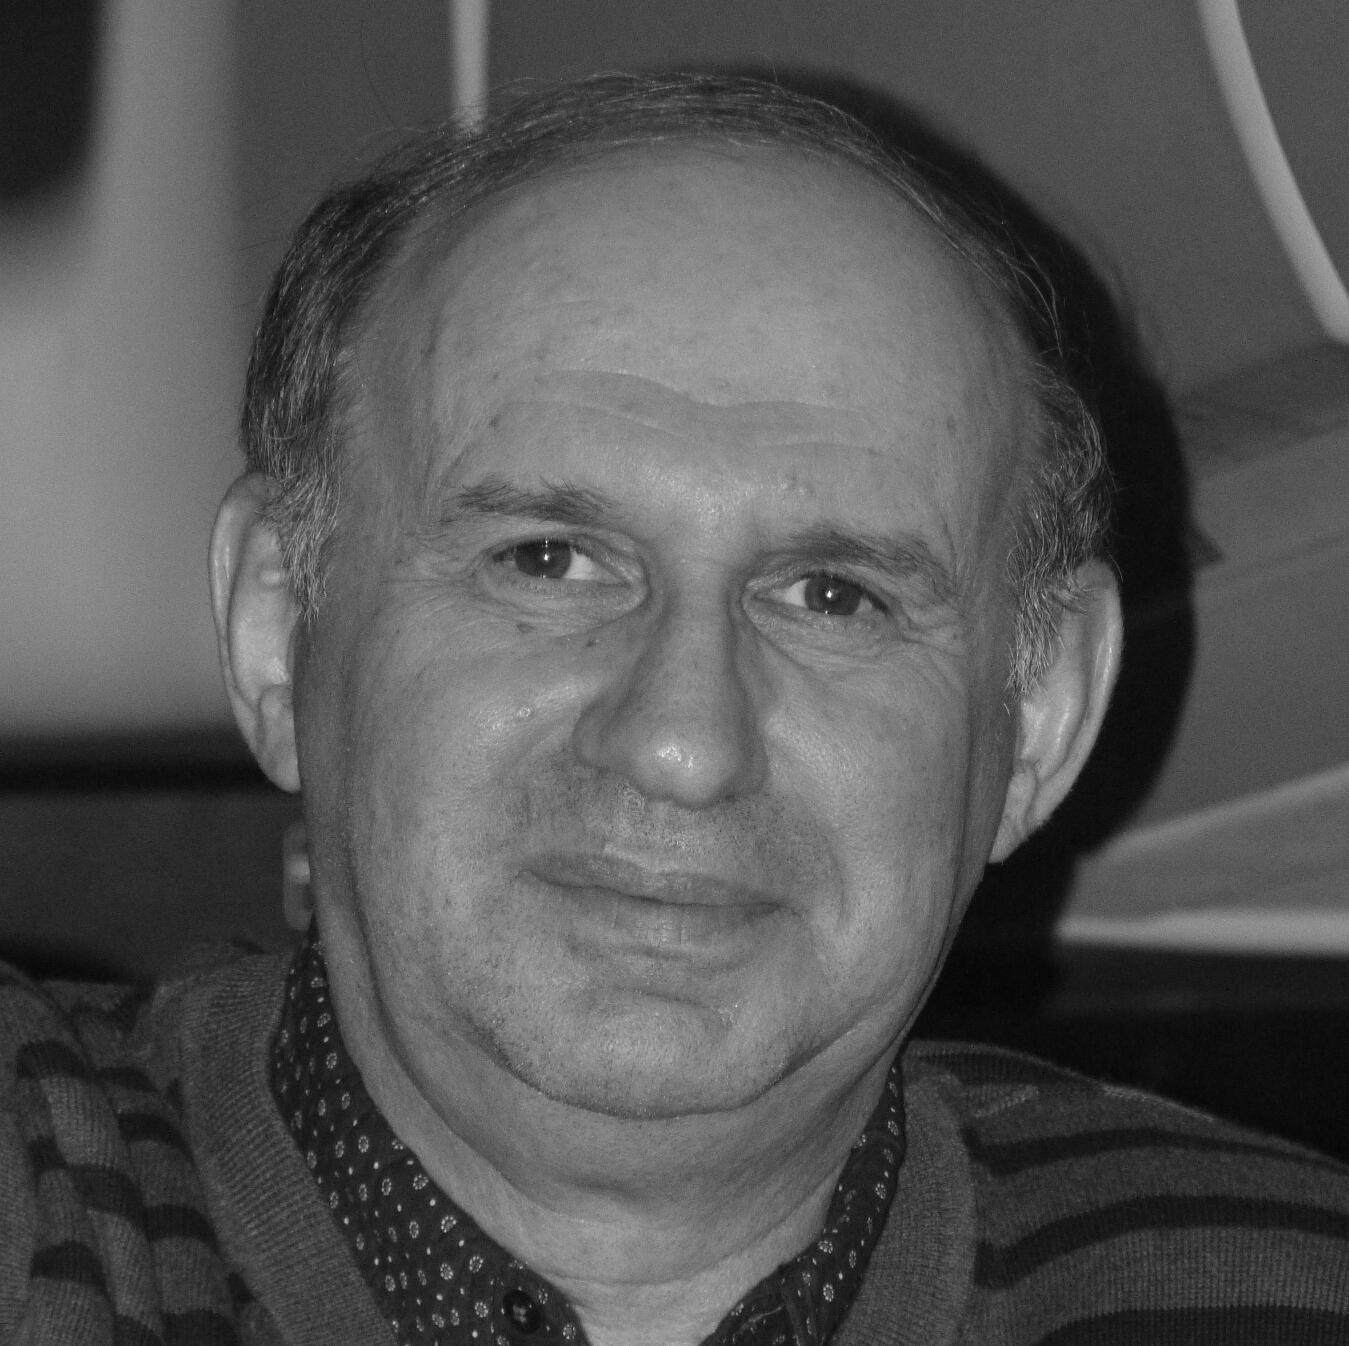 Grigory Kattc